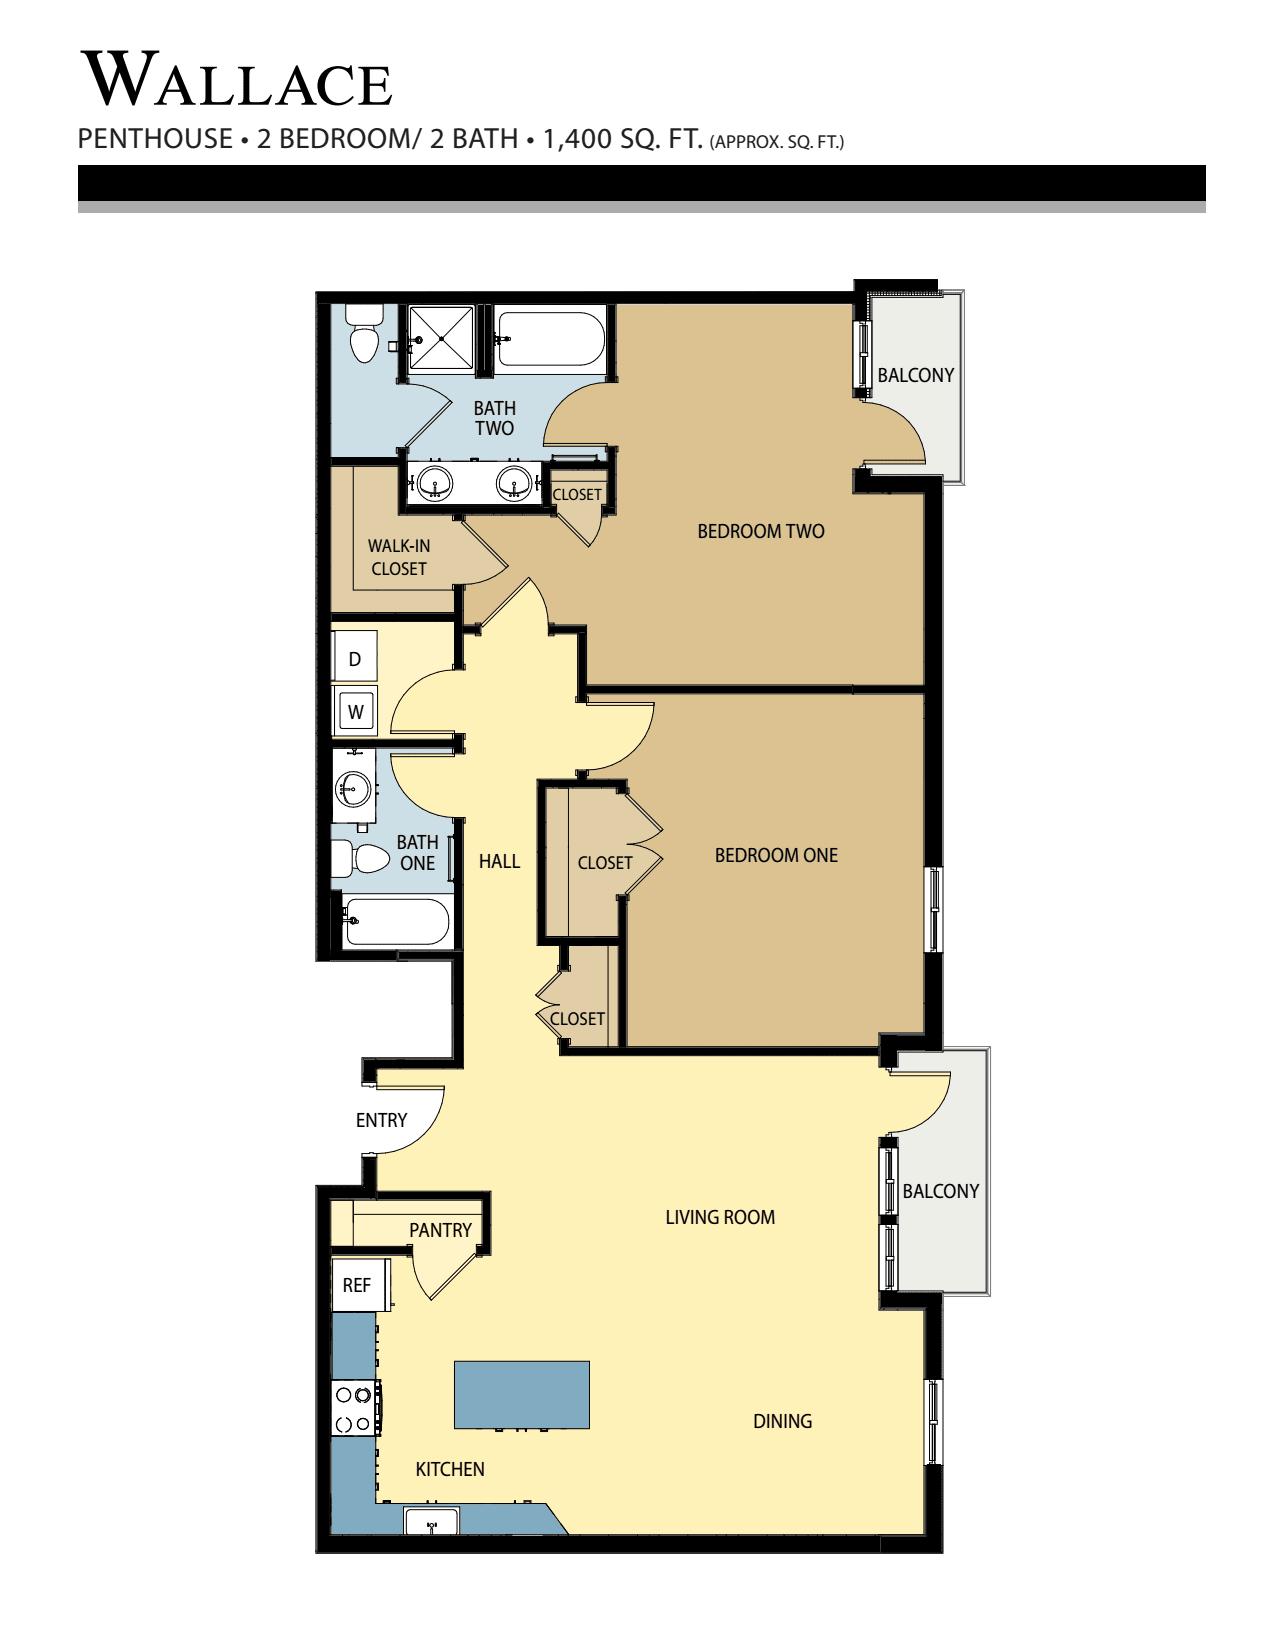 Wallace floor plan - 2 Bed / 2 Bath (1,400 Sq Ft)